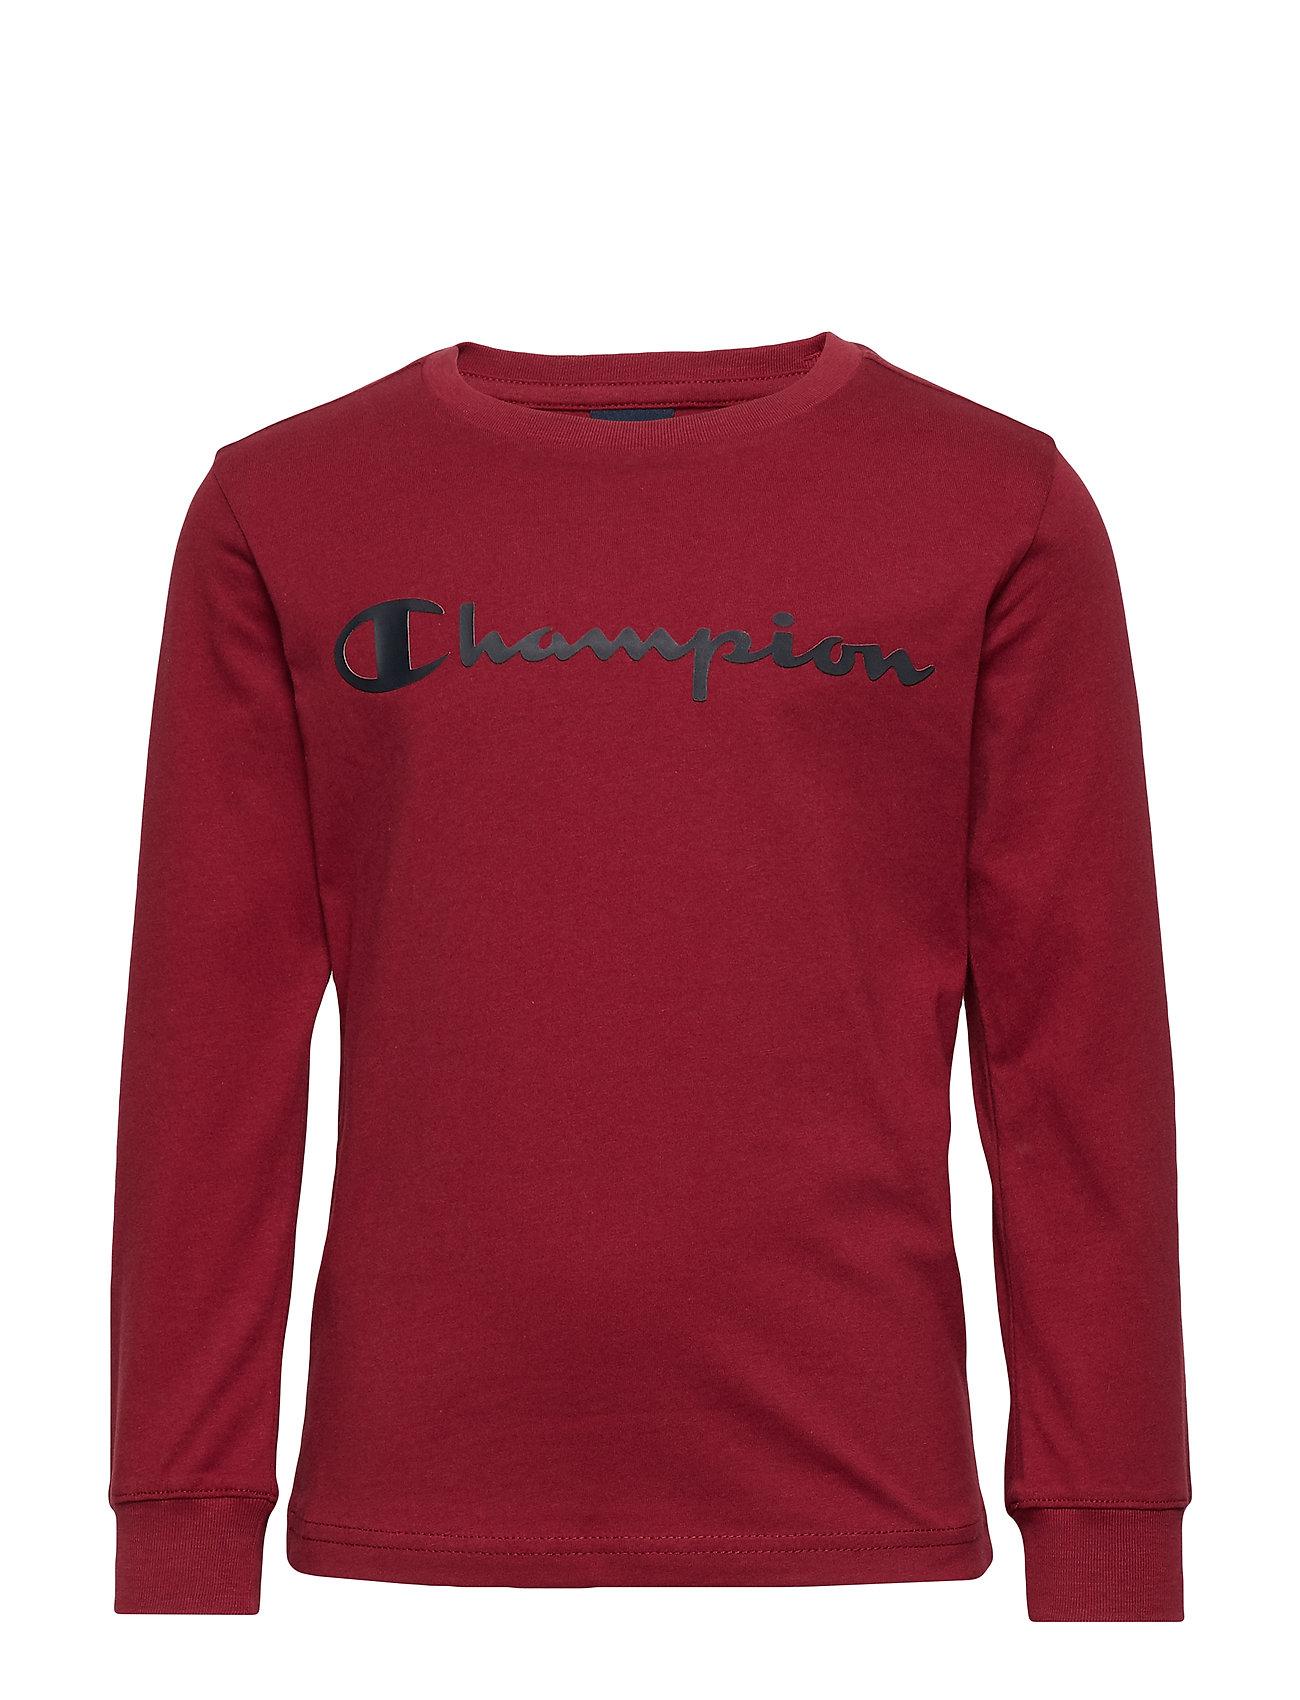 Champion Crewneck Long Sleeve T-Shirt - BIKING RED